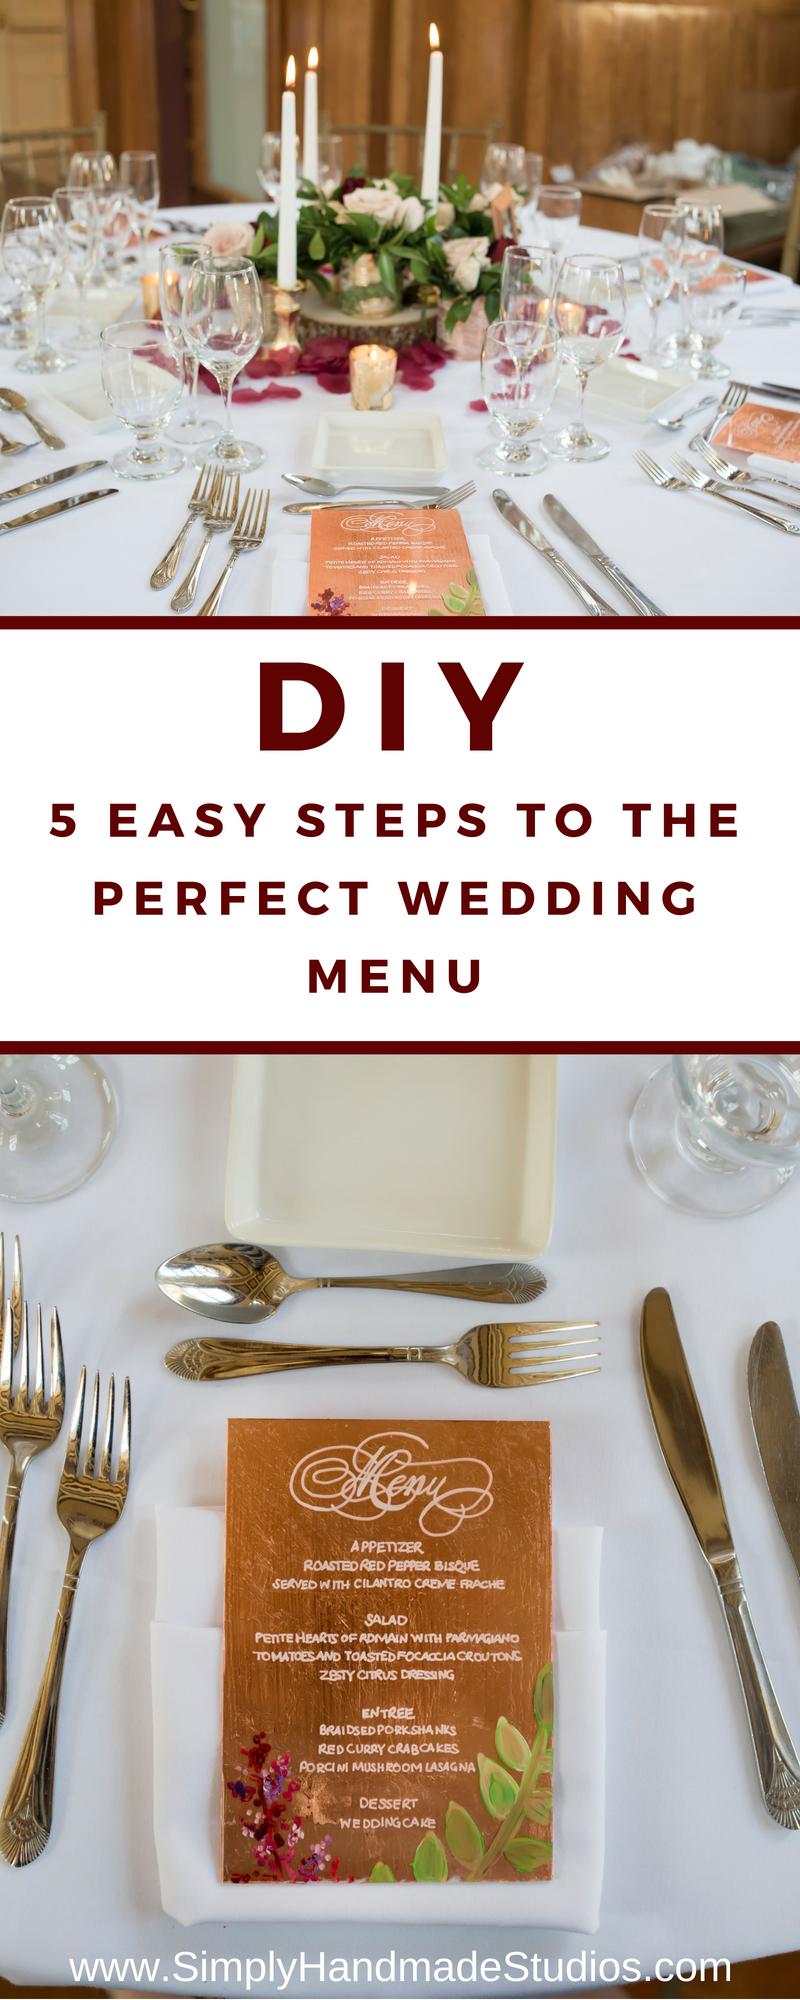 diy wedding menu template — simply handmade  diy wedding